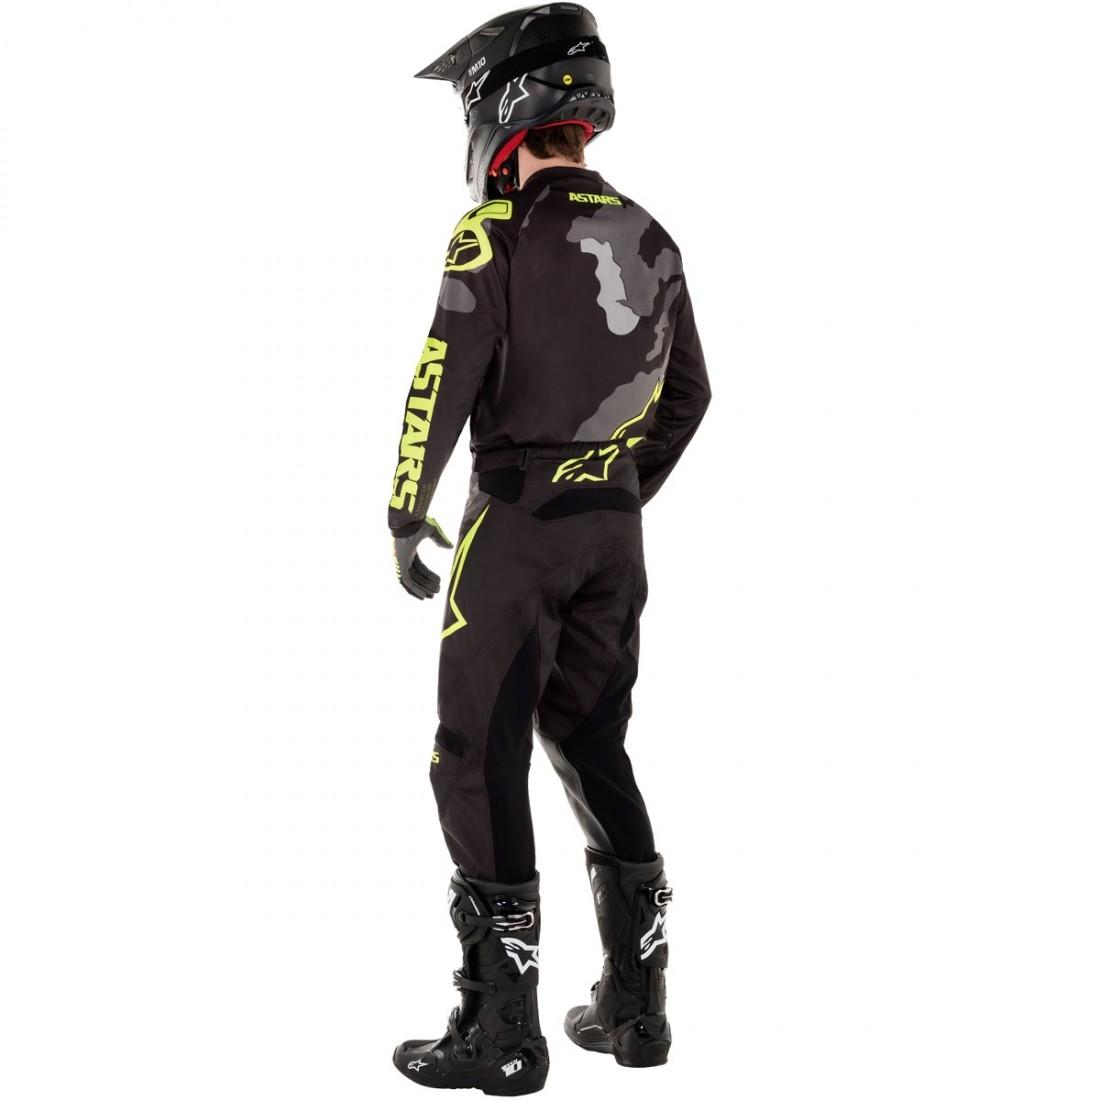 Alpinestars Jersey Racer Tactical Schwarz//Grau Camo//Orange Fluo